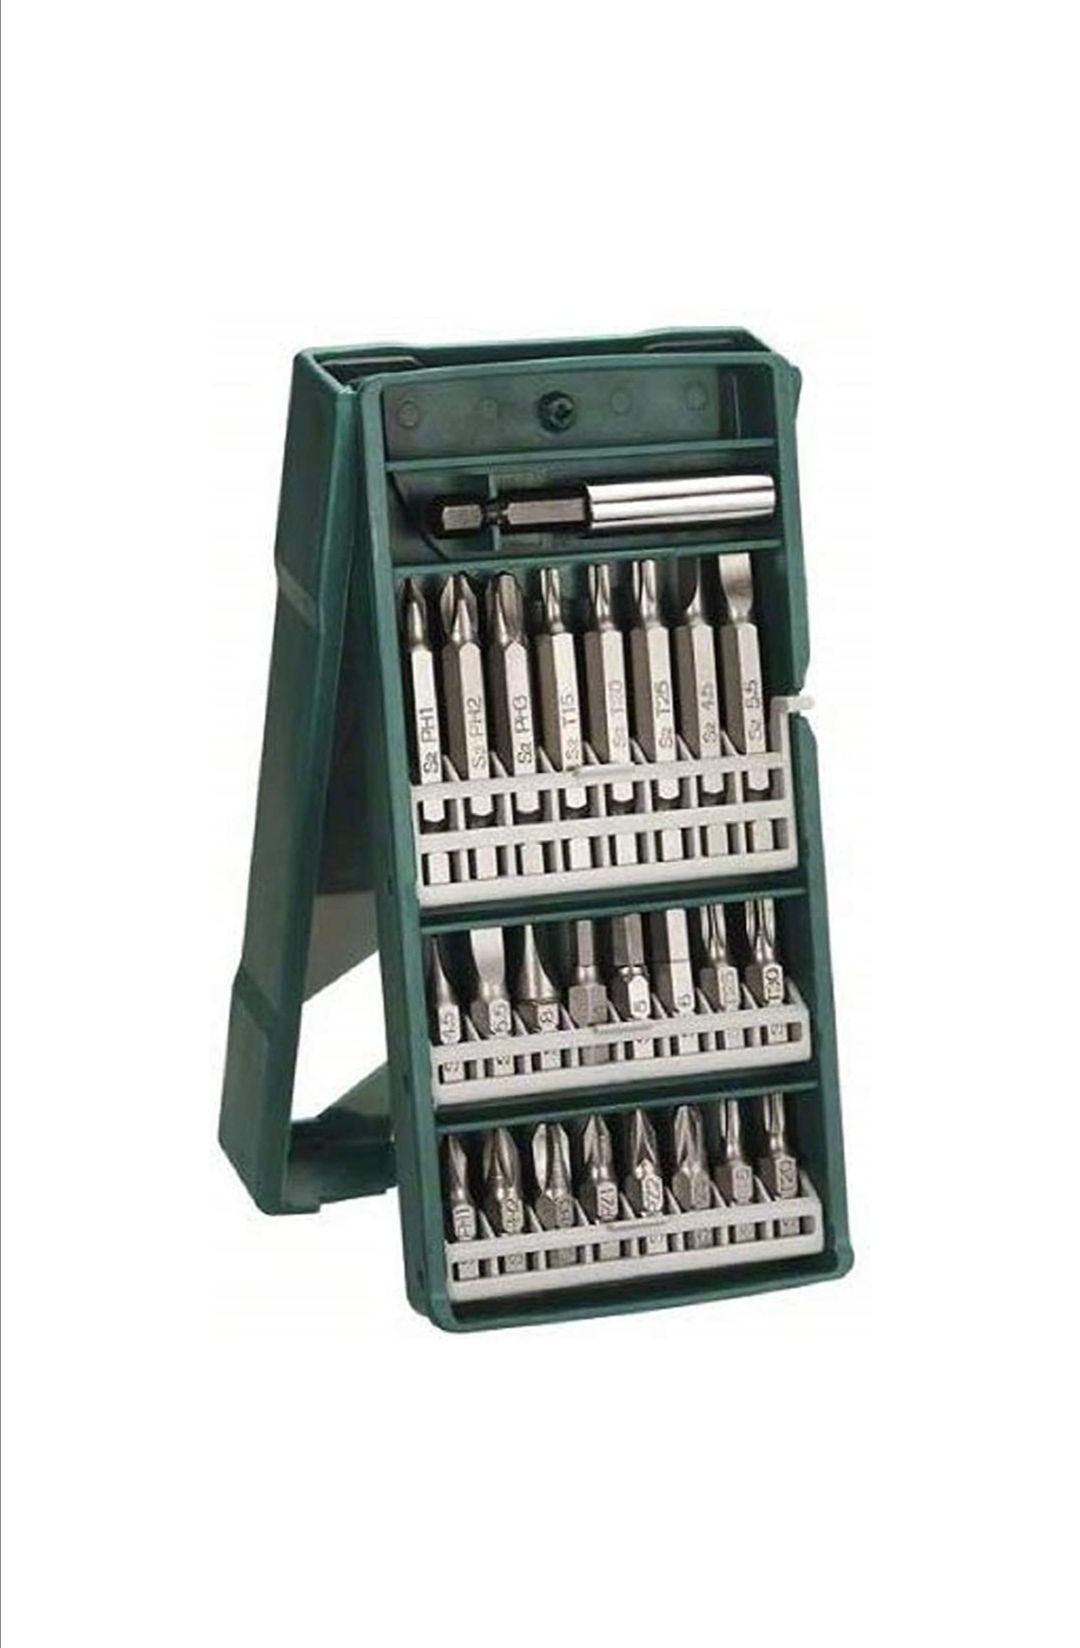 Bosch Power Tools Accessories 2607019676 Mini X-Line Screwdriving Set (25 Pieces) - £7.98 Prime / +£4.49 non Prime @ Amazon